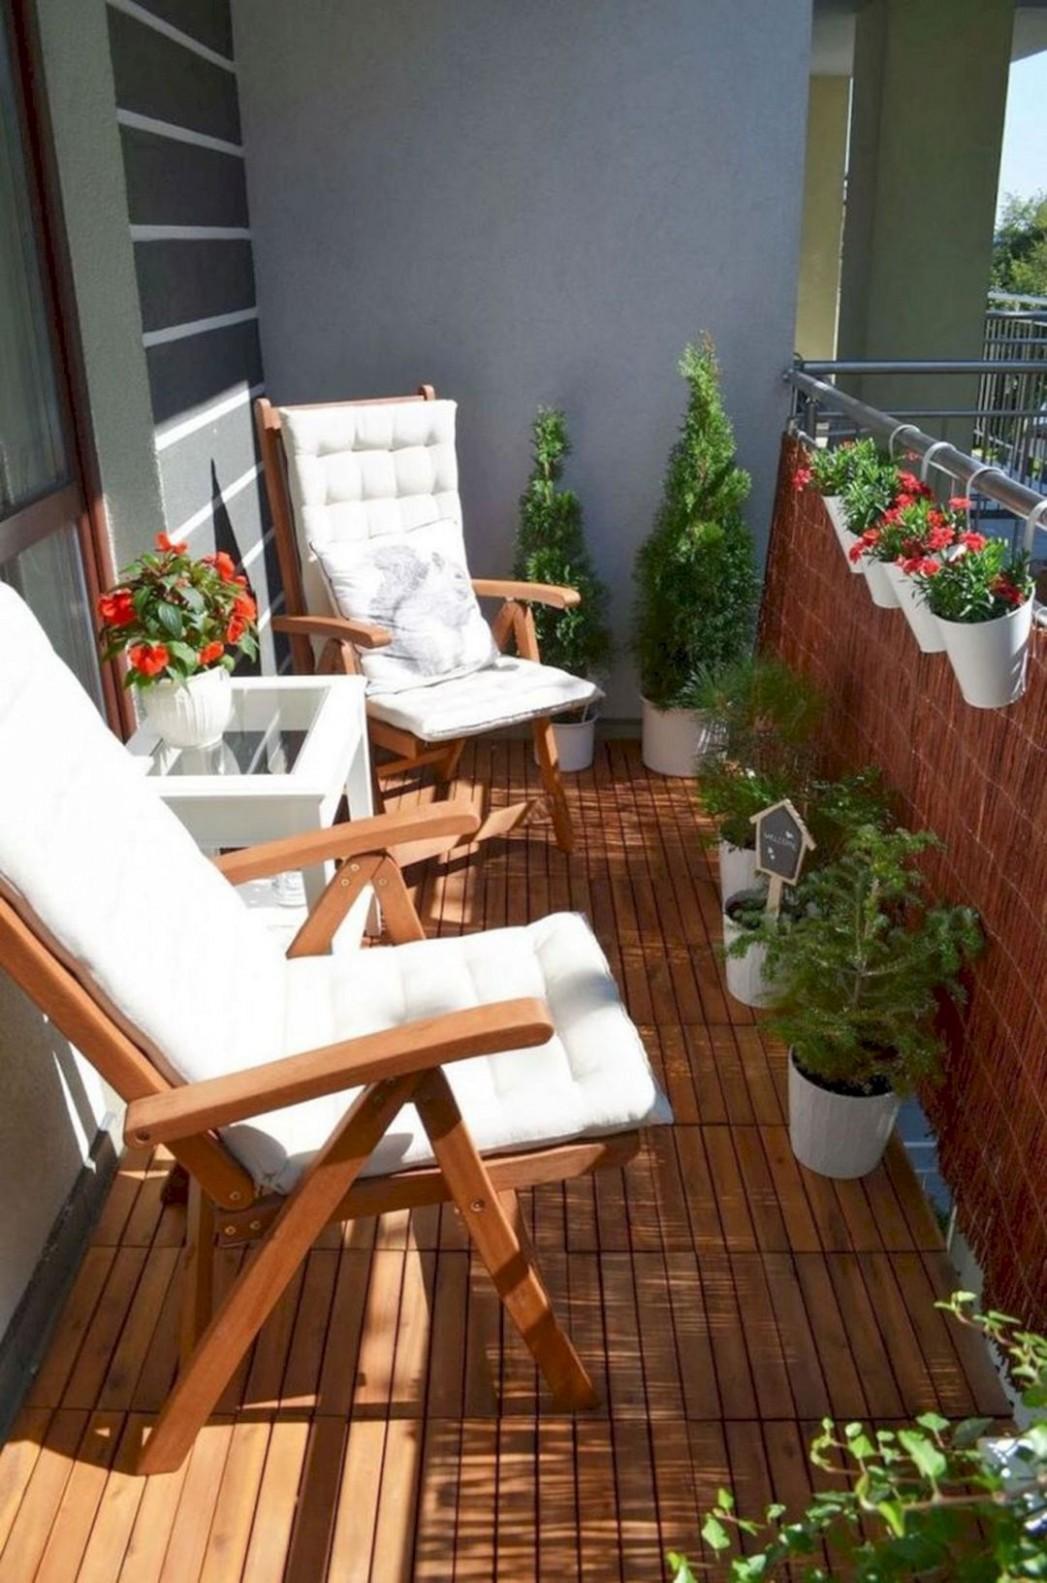 12+ Incredible Small Apartment Balcony Design Ideas On A Budget To  - Apartment Balcony Ideas On A Budget